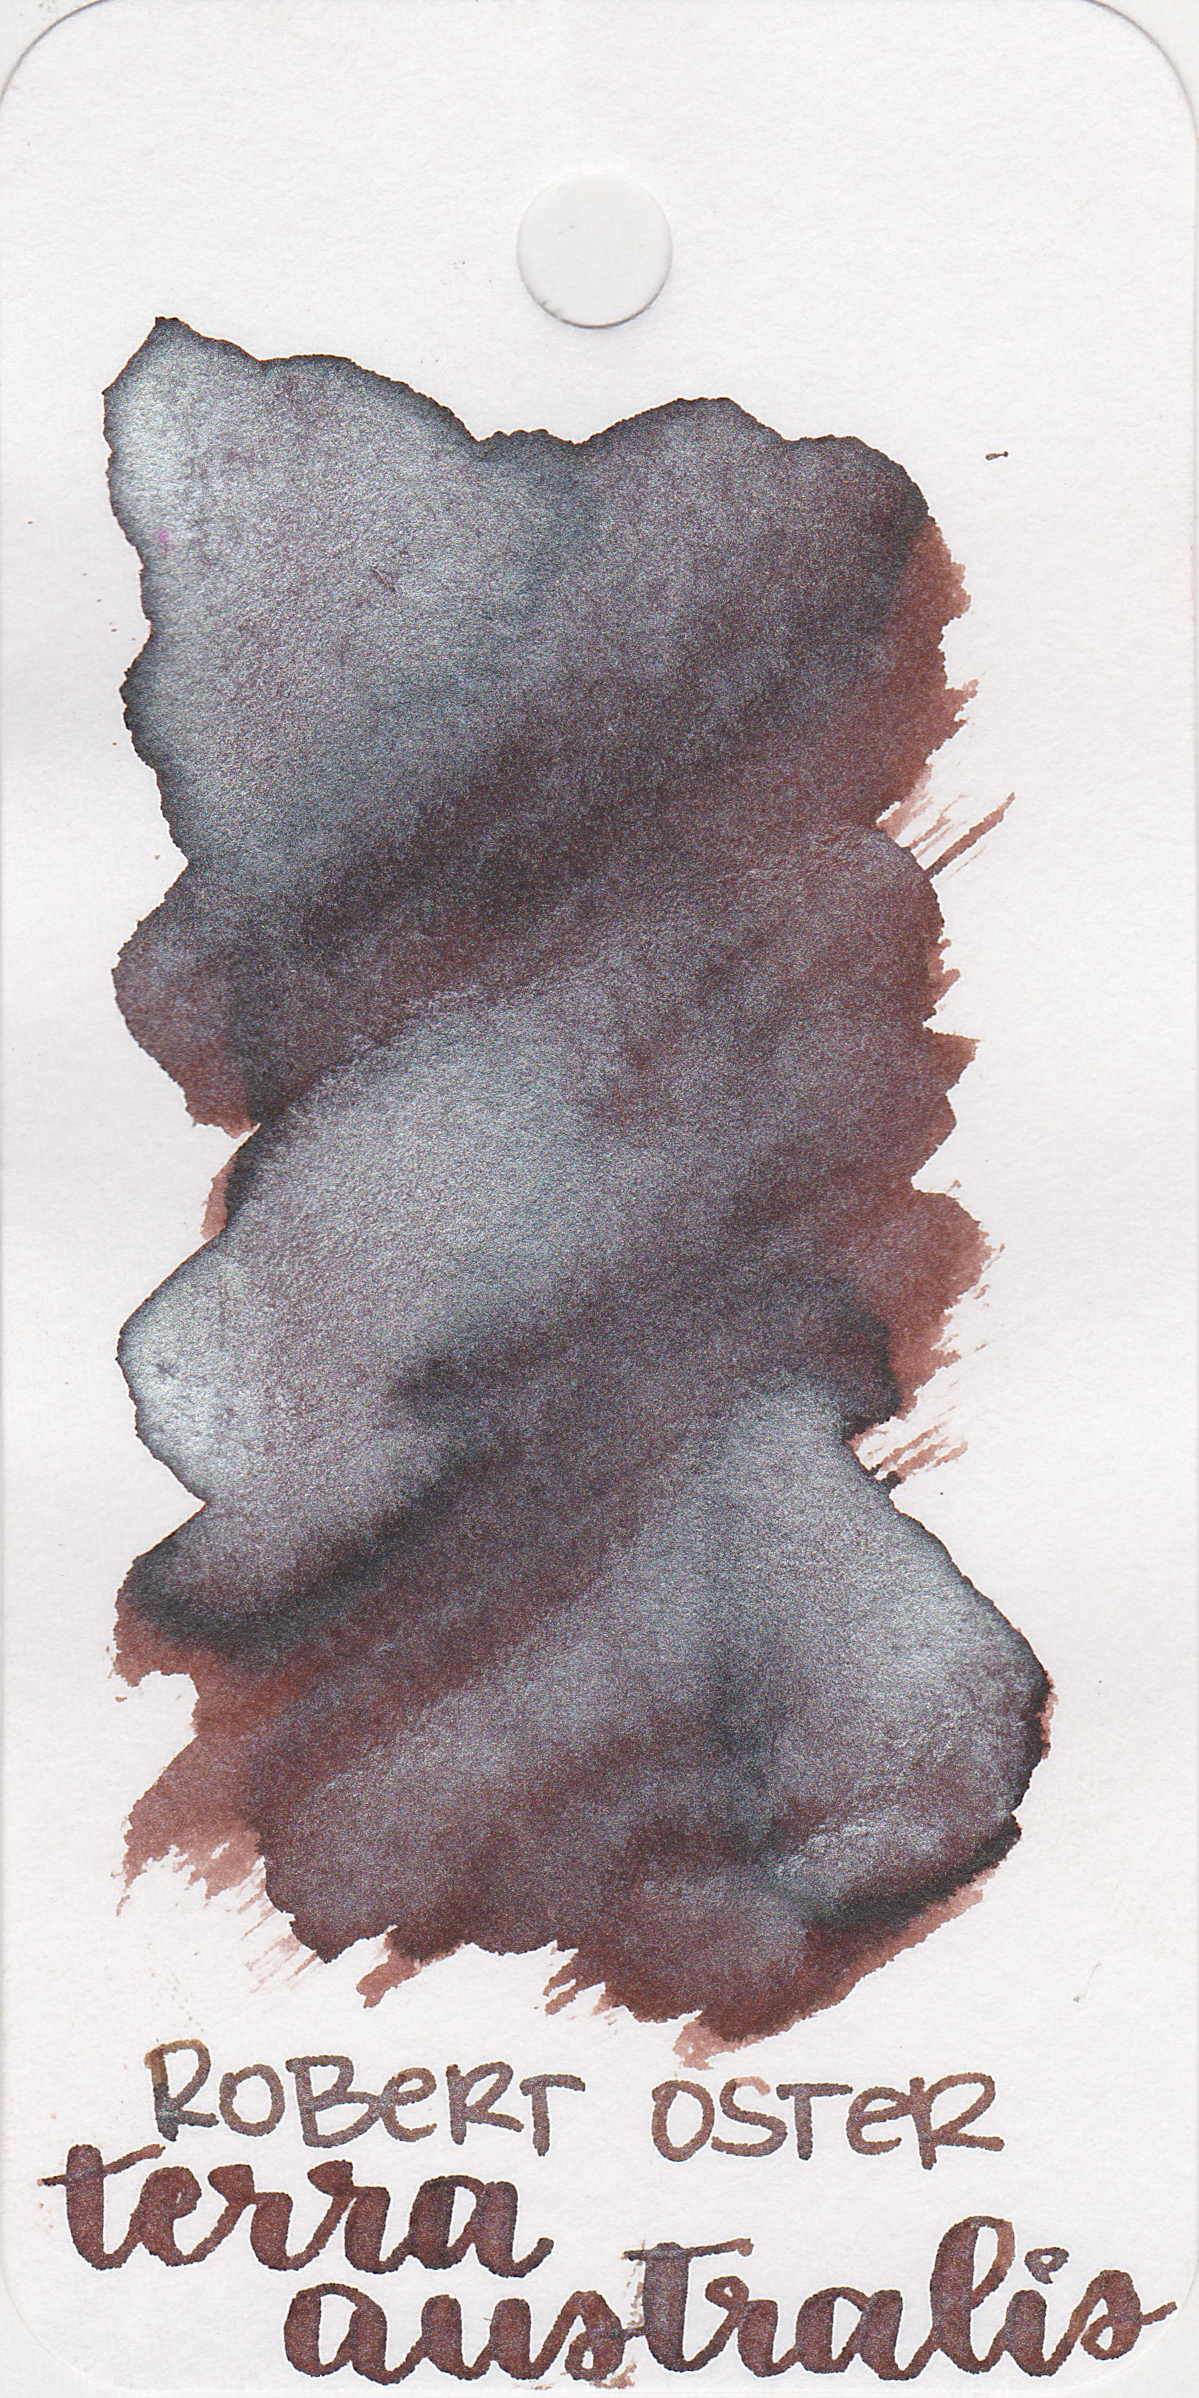 ro-terra-australis-1.jpg